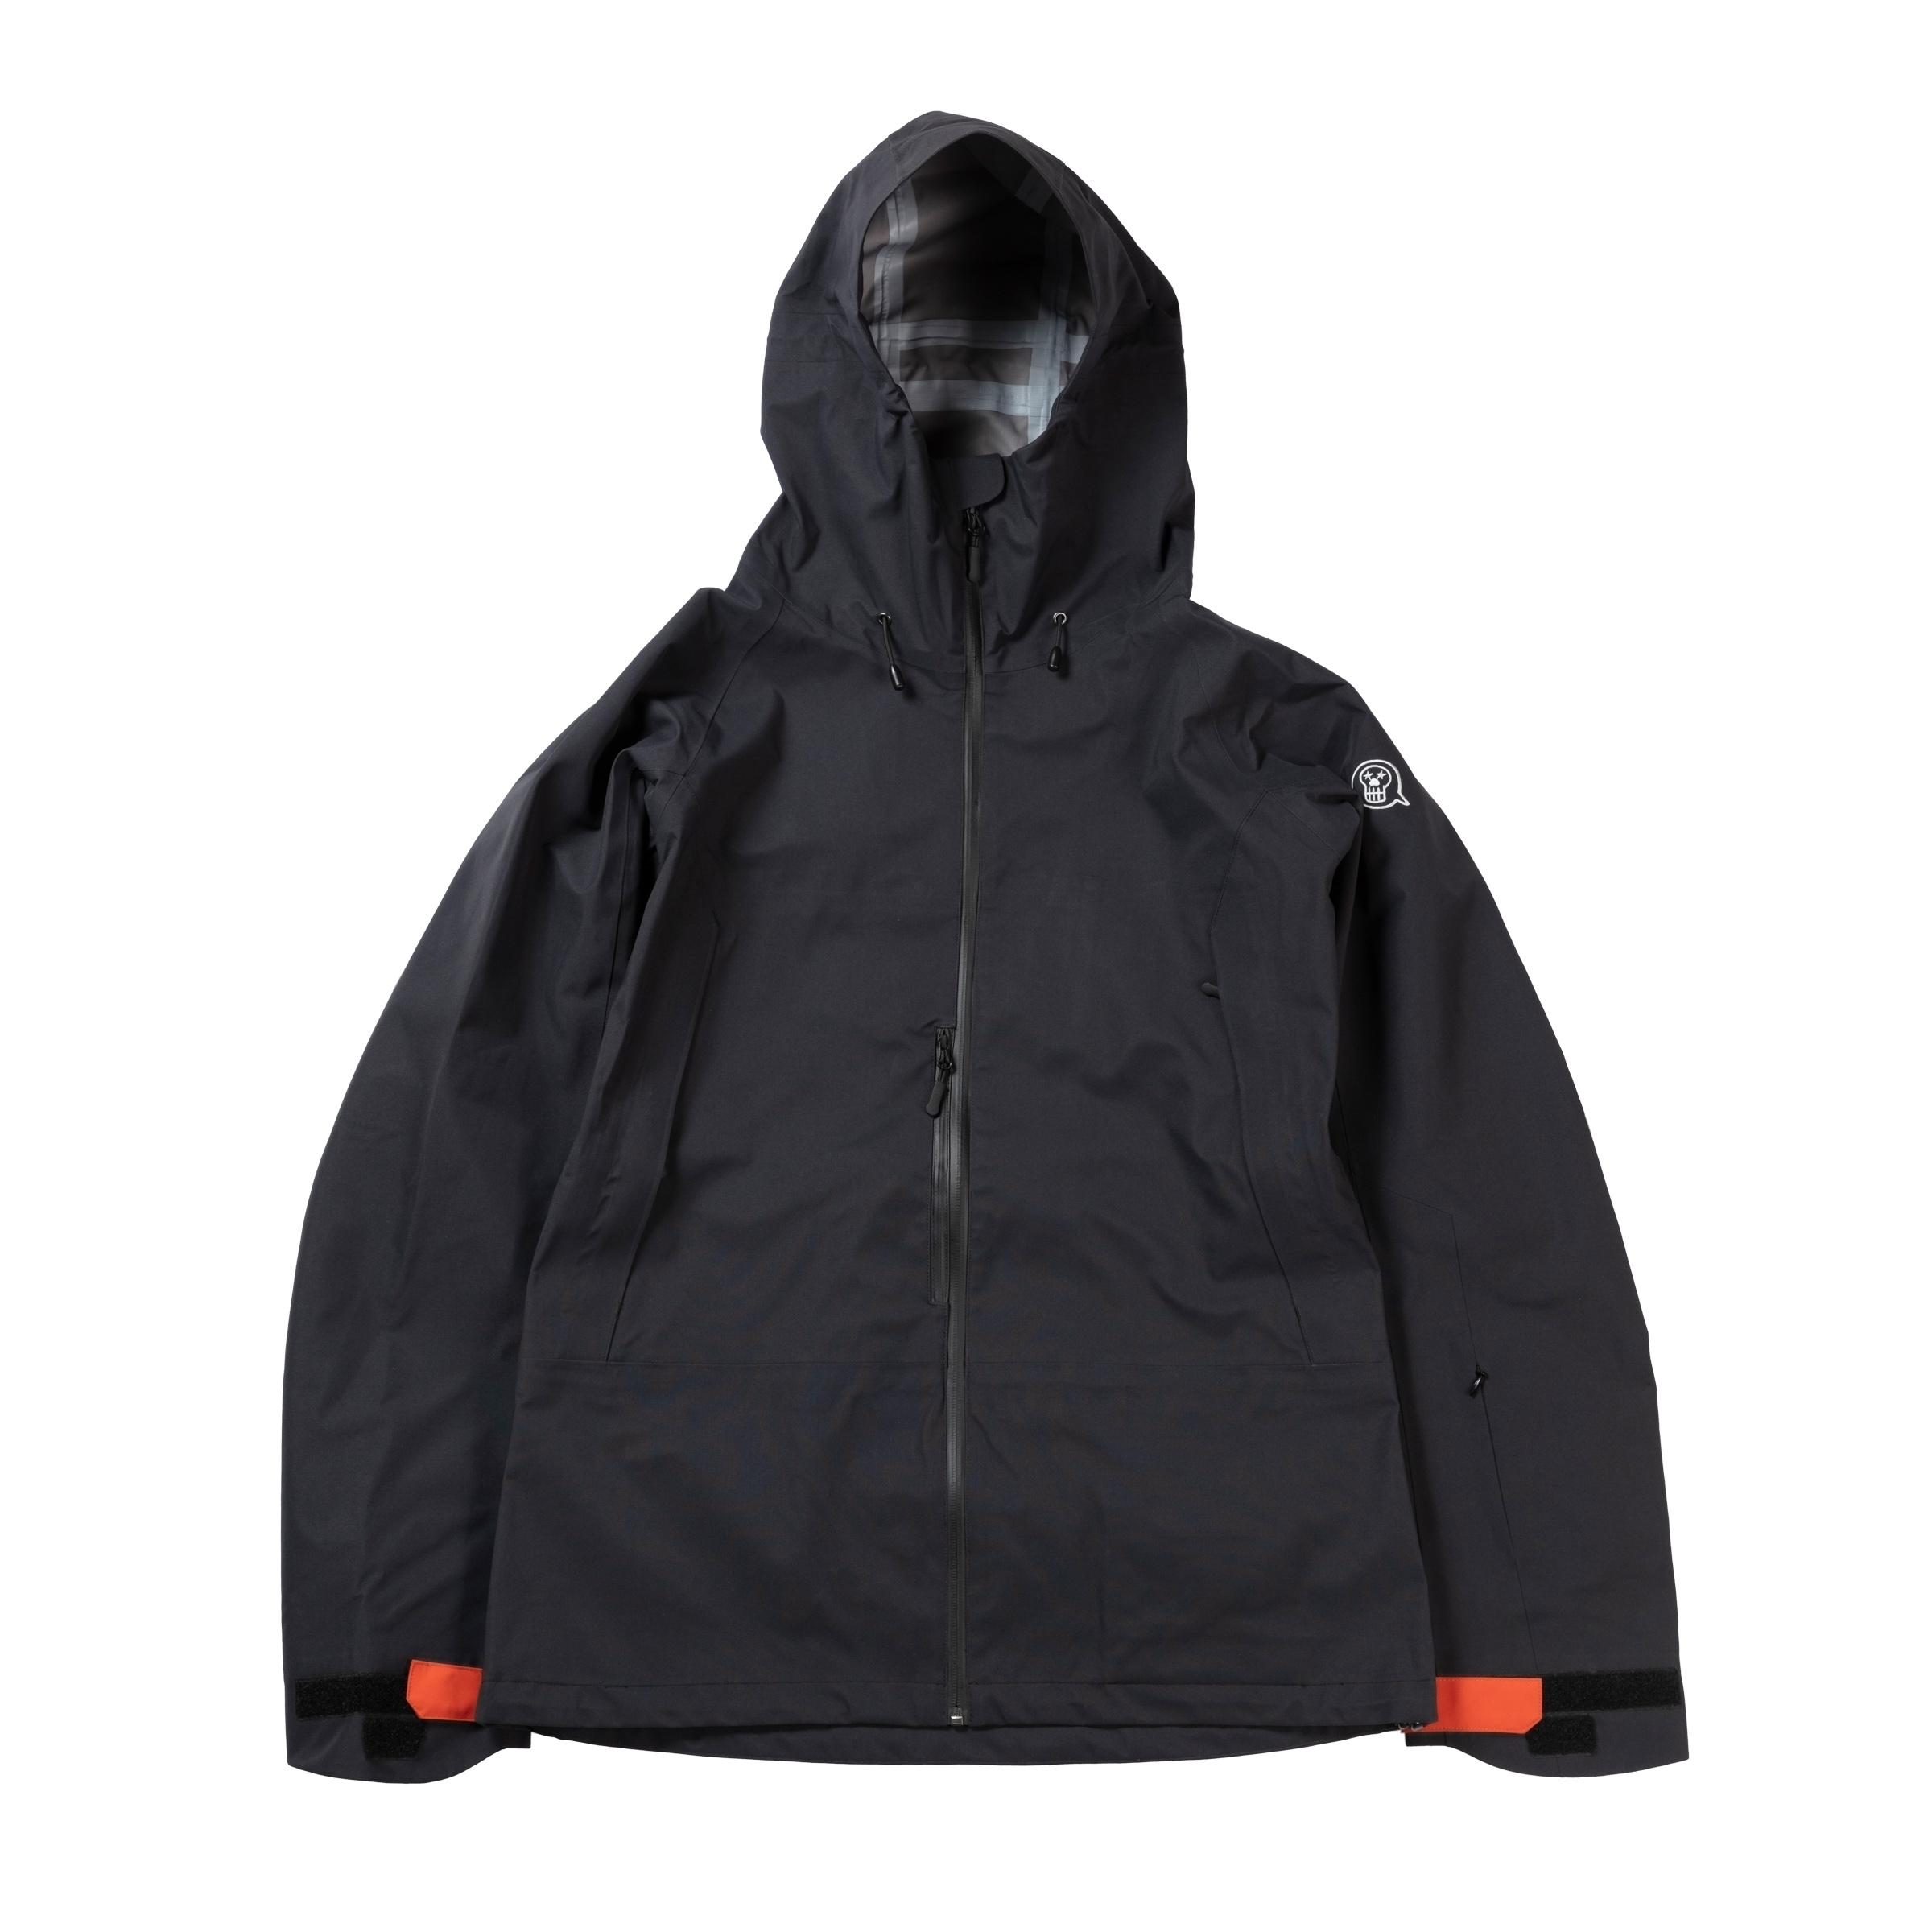 2021unfudge snow wear // CLOUD JACKET // BLACK / 10月中旬発送